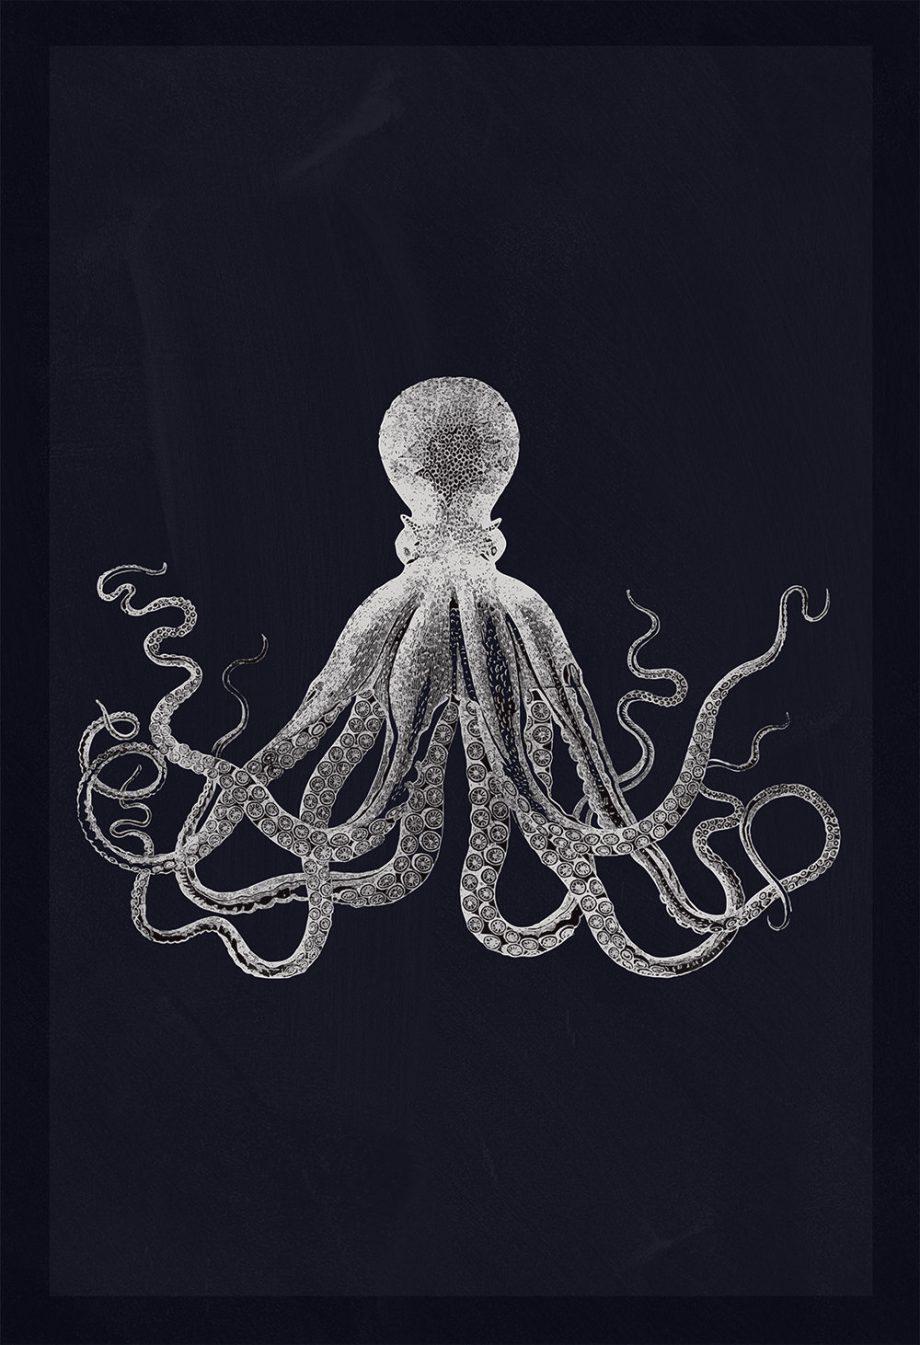 Lord Bodners Octopus Art Print Nautical Decor Sticker